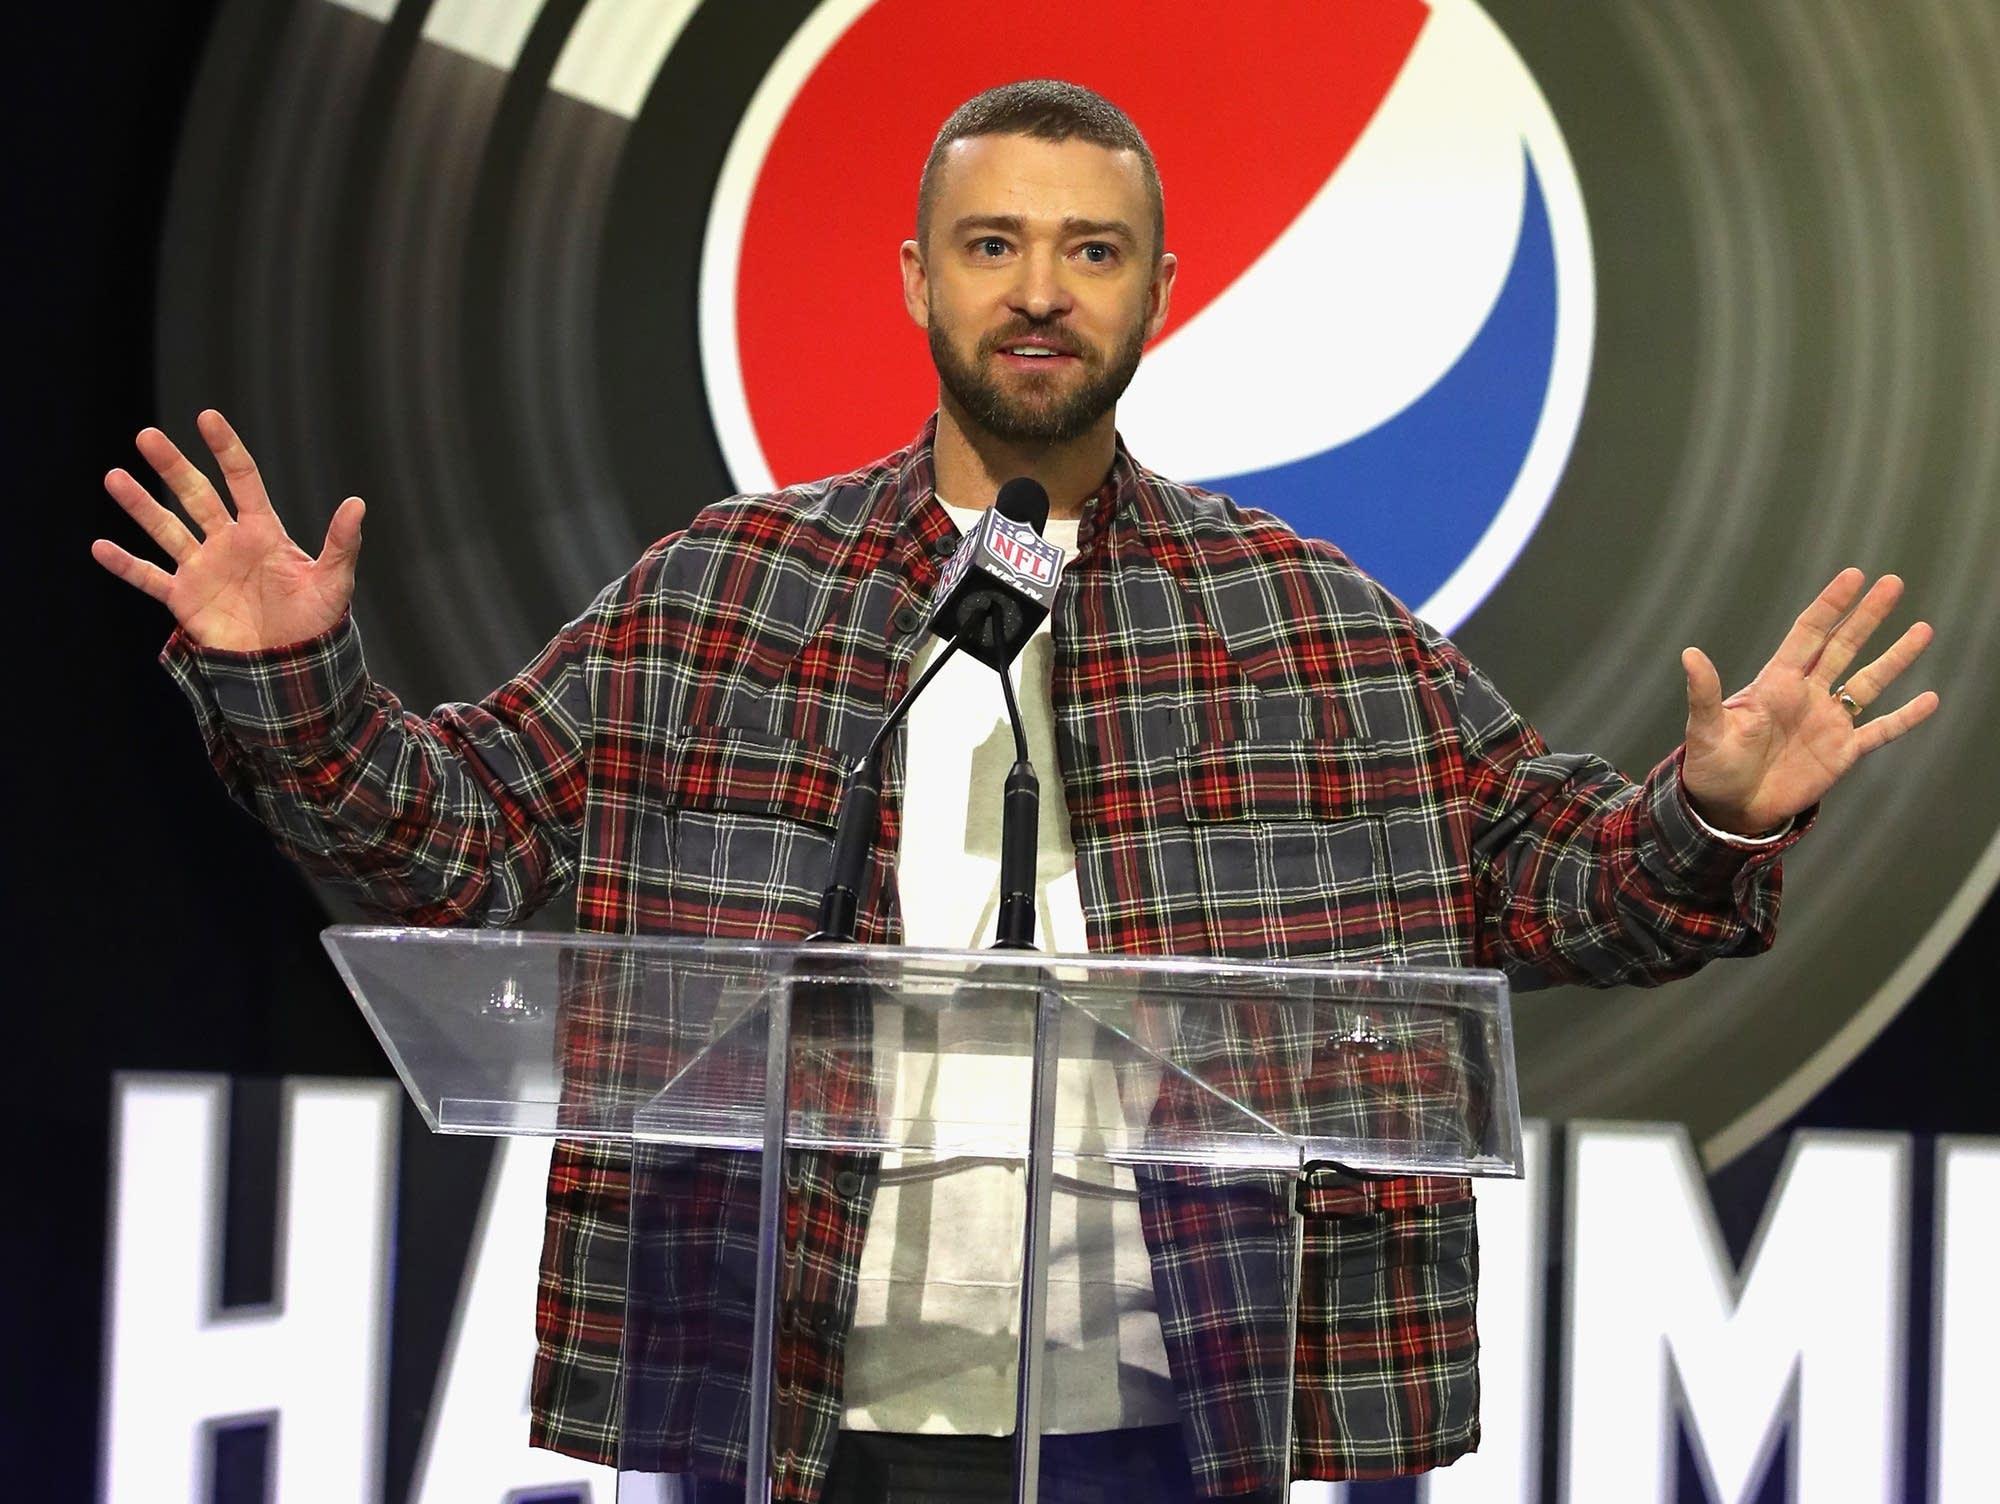 Justin Timberlake at a Minneapolis press conference, Feb. 1, 2017.